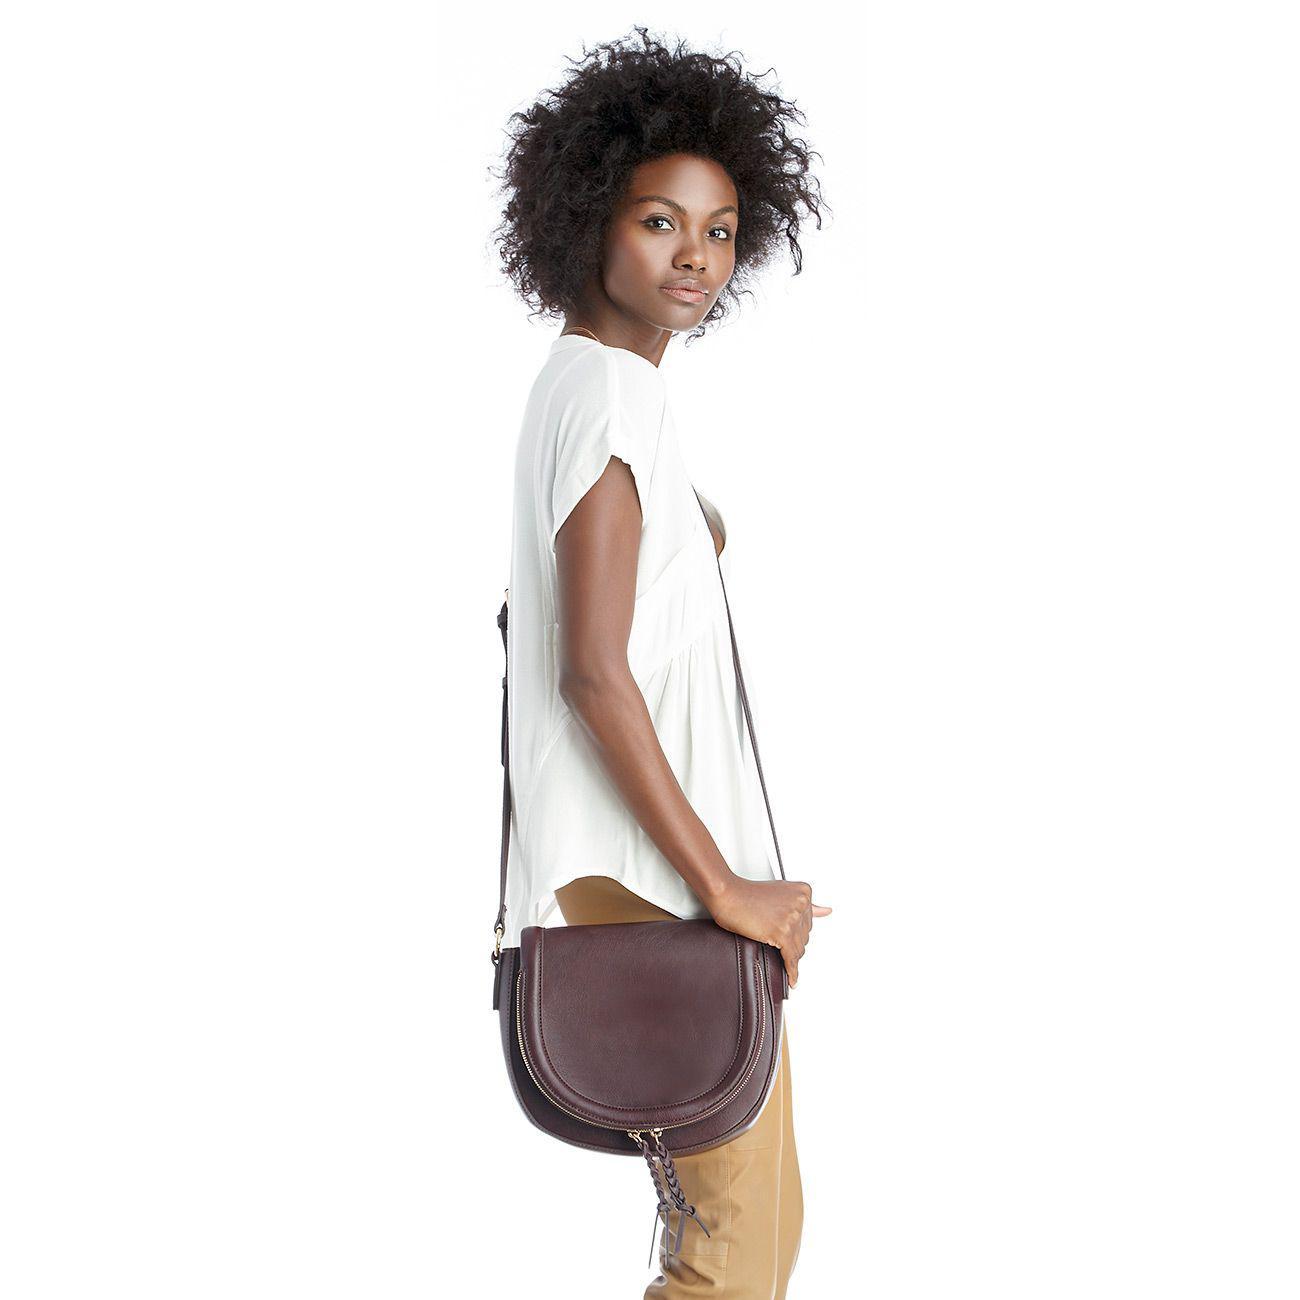 Lyst - Sole Society Thalia Vegan Leather Saddlebag With Braided ... 6638e3e964dc3